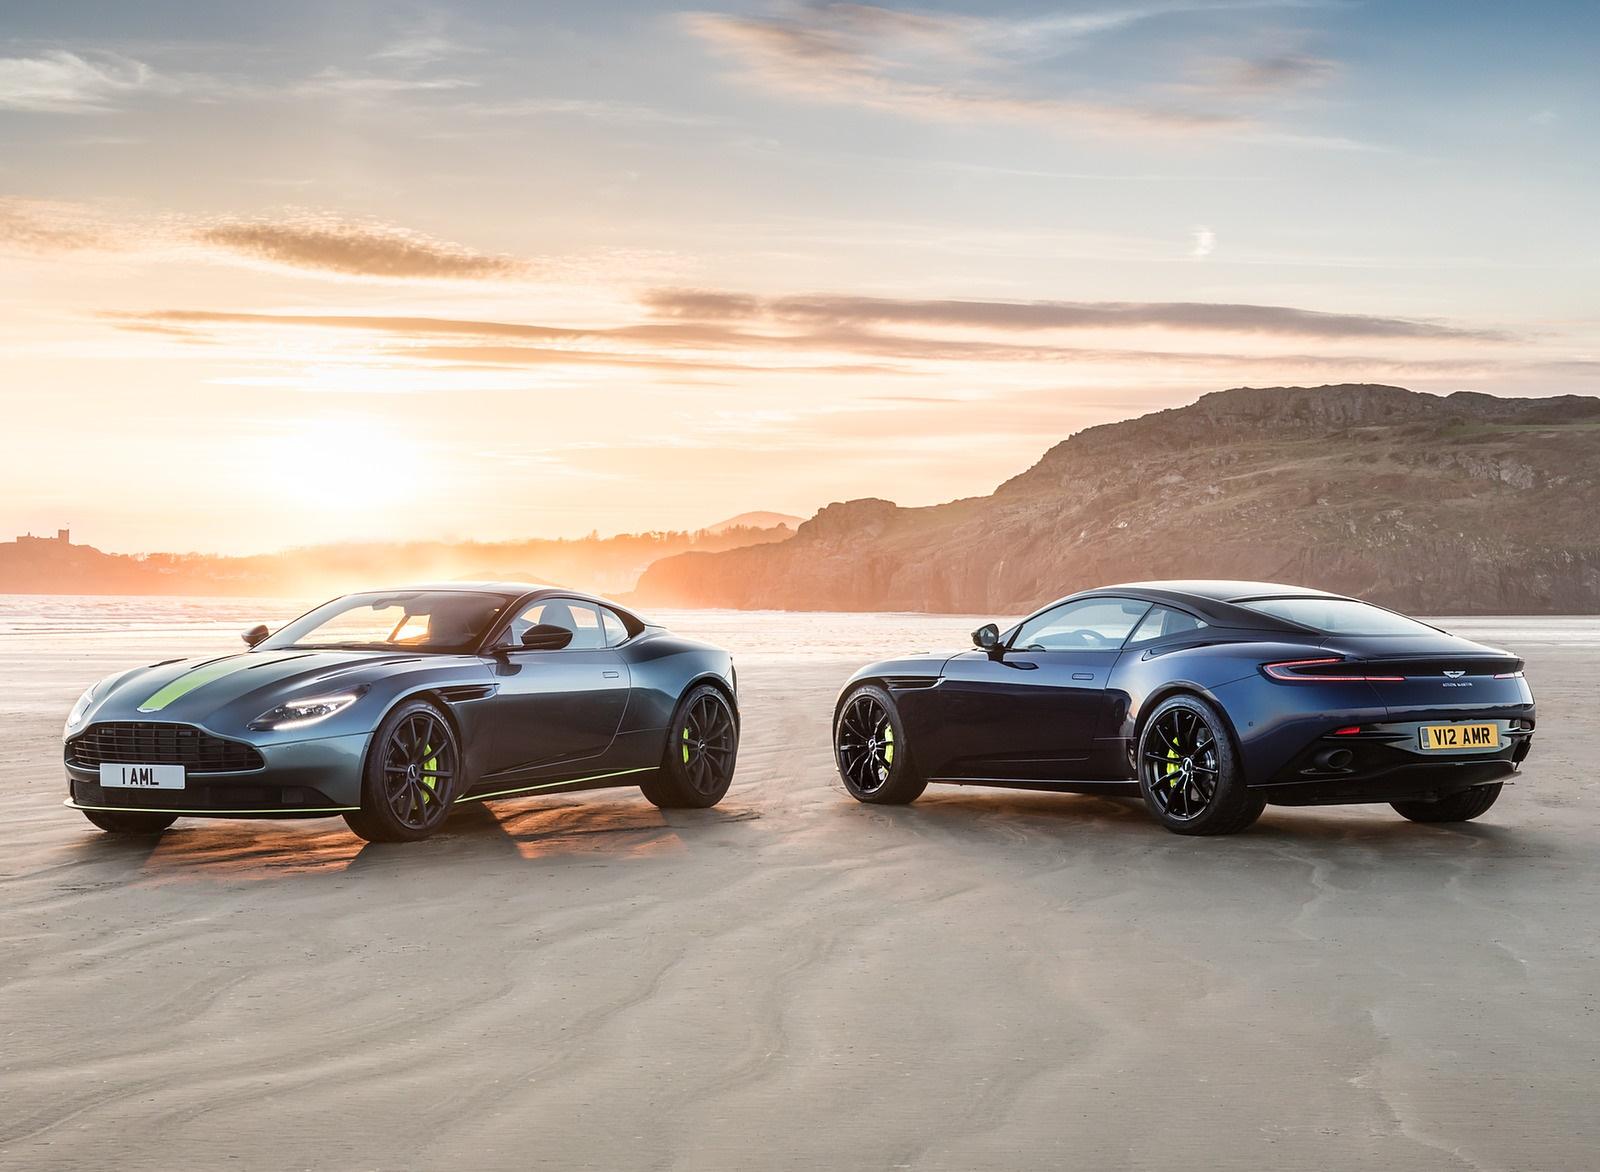 2019 Aston Martin DB11 AMR Wallpapers (9)